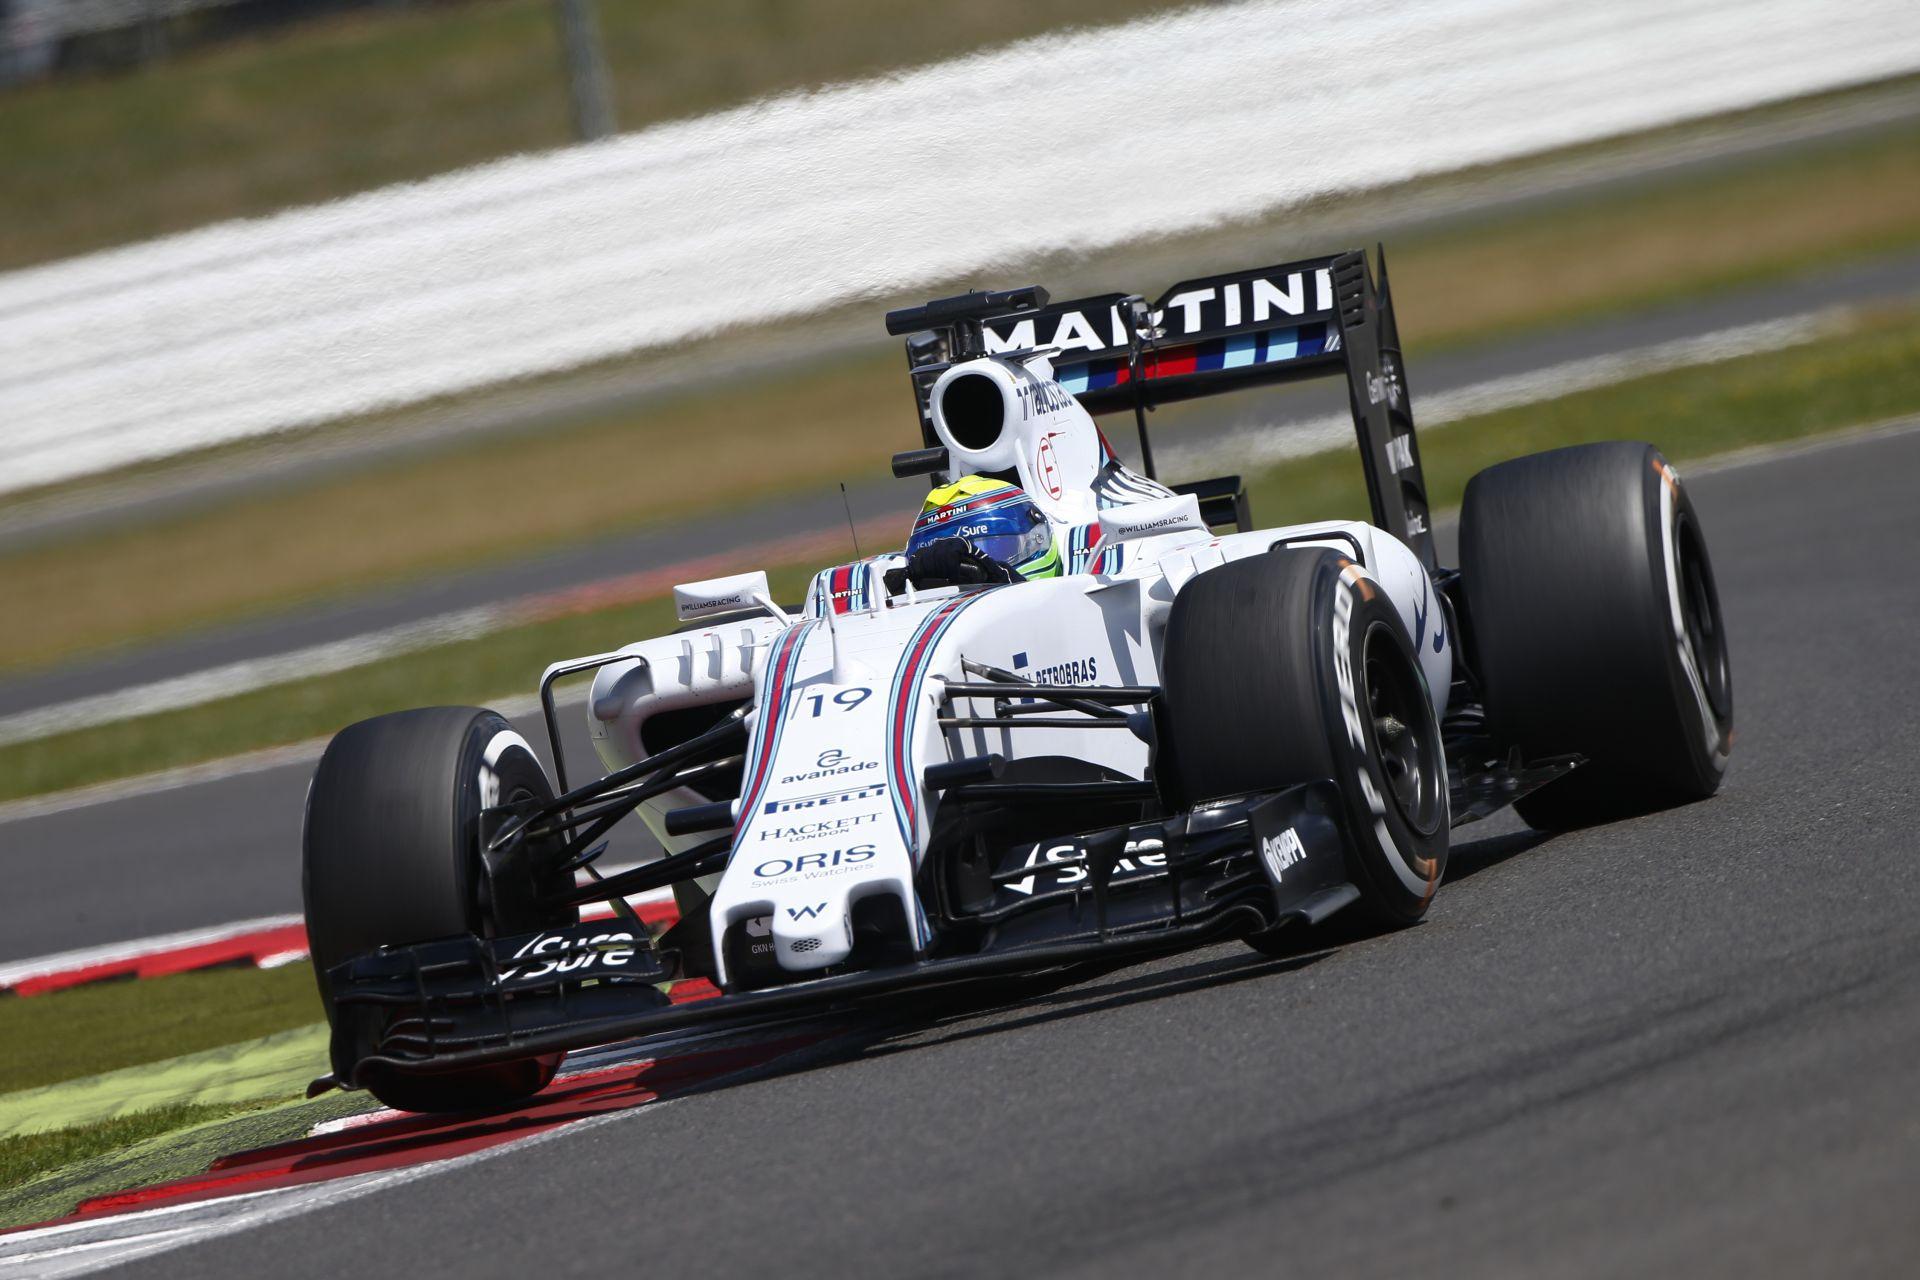 Videón Massa nagyon durva startja Silverstone-ból: A brazil betette a Williamst